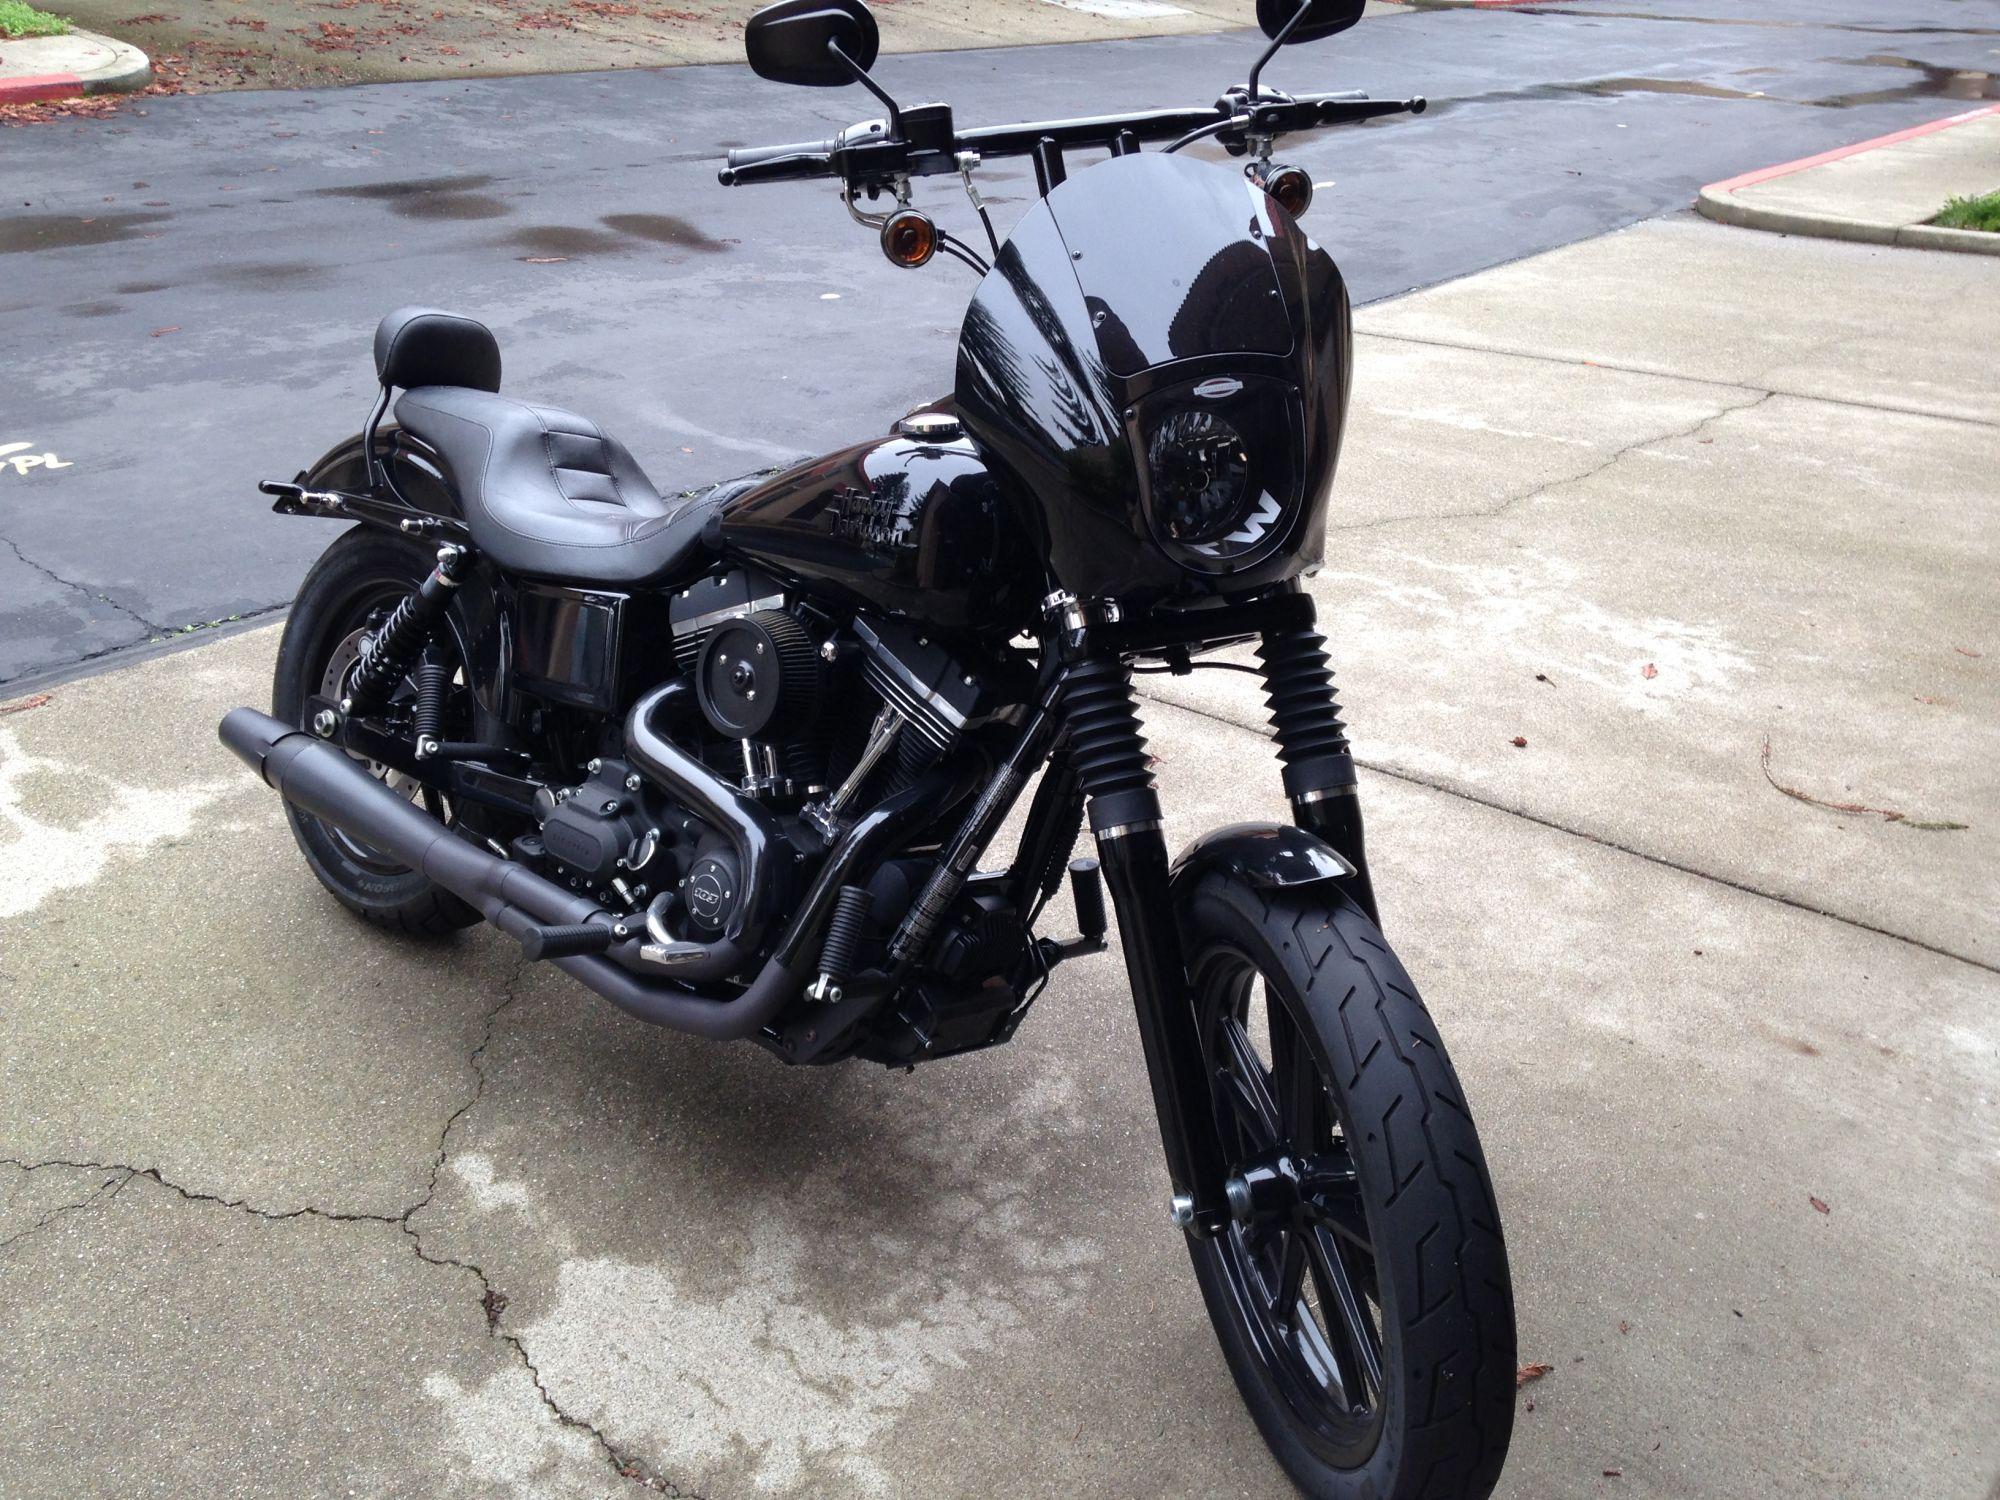 6b621020daa Thug Style   Club Style Dyna pic s - Page 648 - Harley Davidson Forums